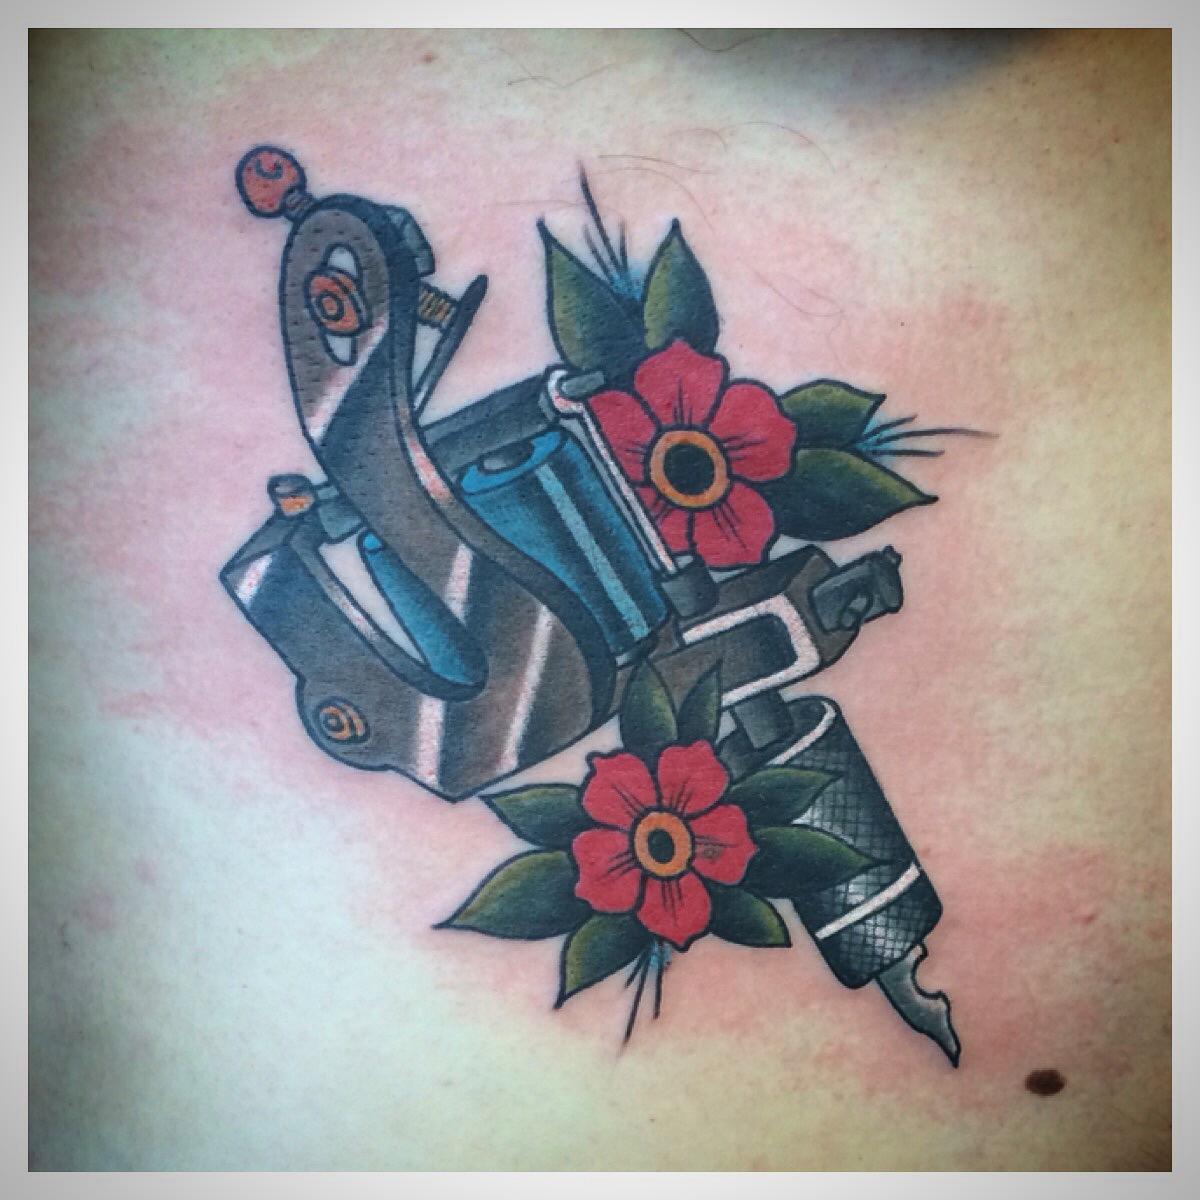 989_Tattoomachine